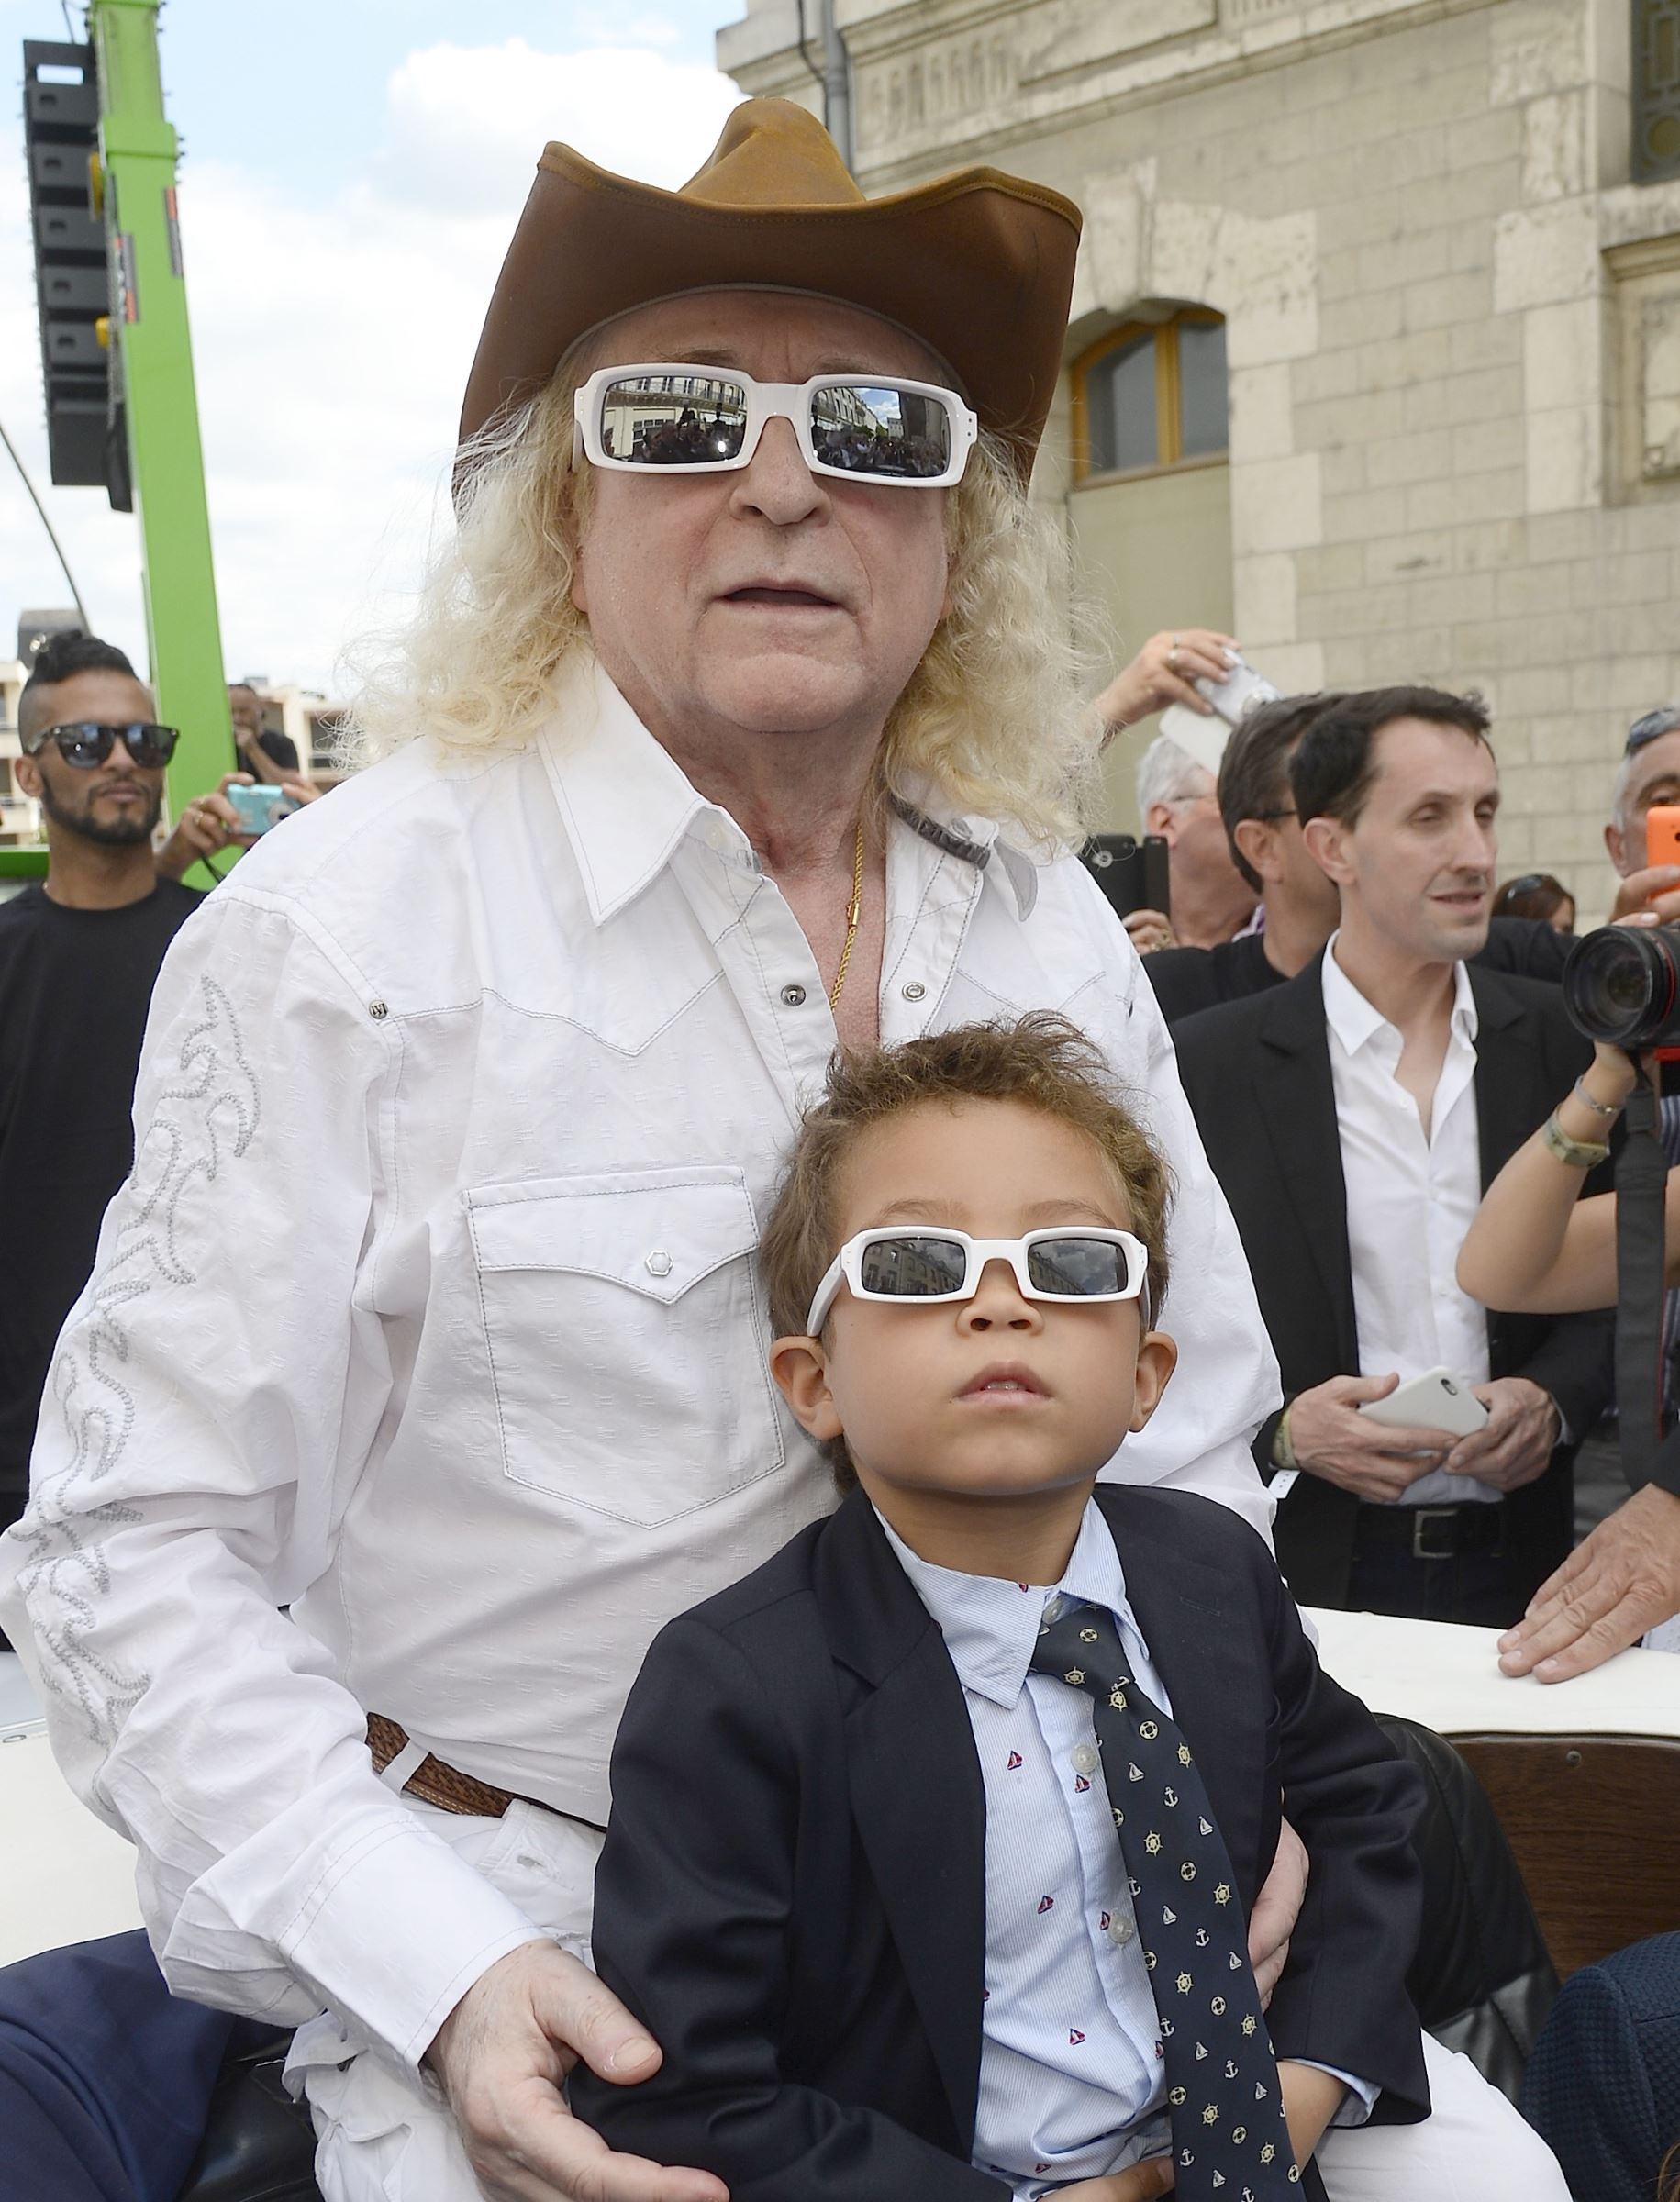 Michel Polnareff Sans Ses Lunette : michel, polnareff, lunette, يسمى, الأمهات, الليزر, Michel, Polnareff, Lunettes, Lauriebuttigieg.com